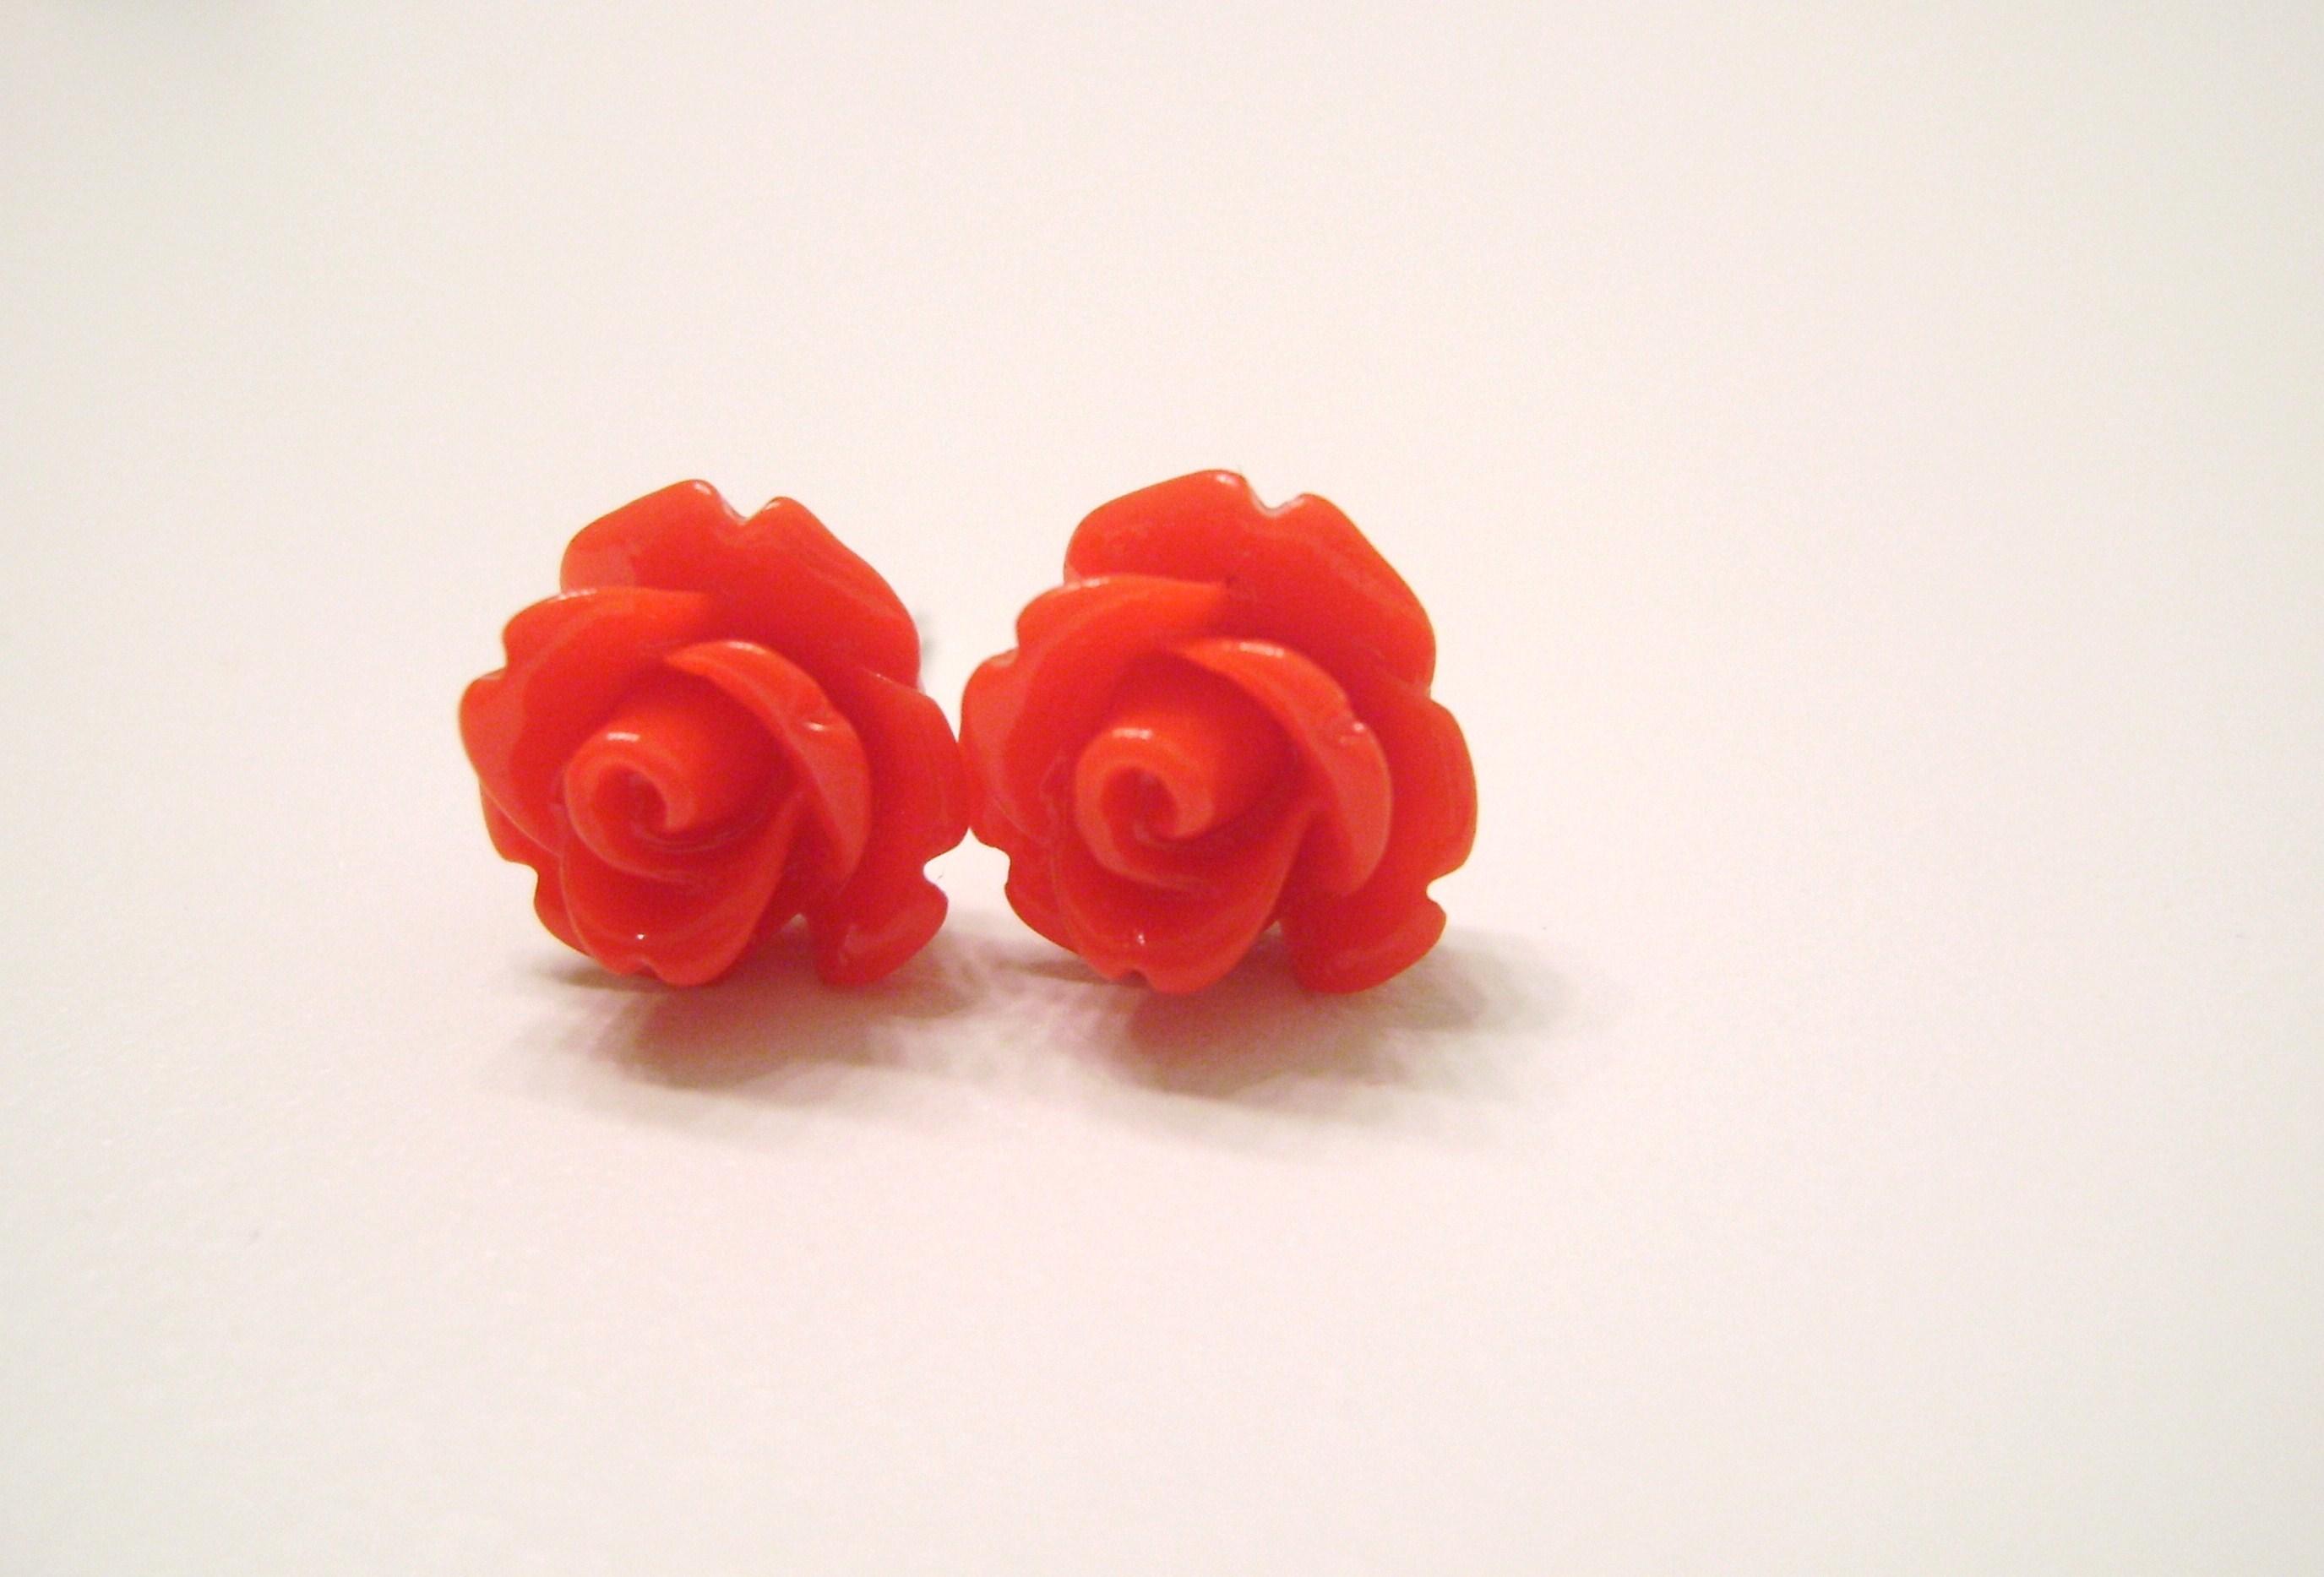 Red Rose Earrings Red Rose Flower Stud Earrings